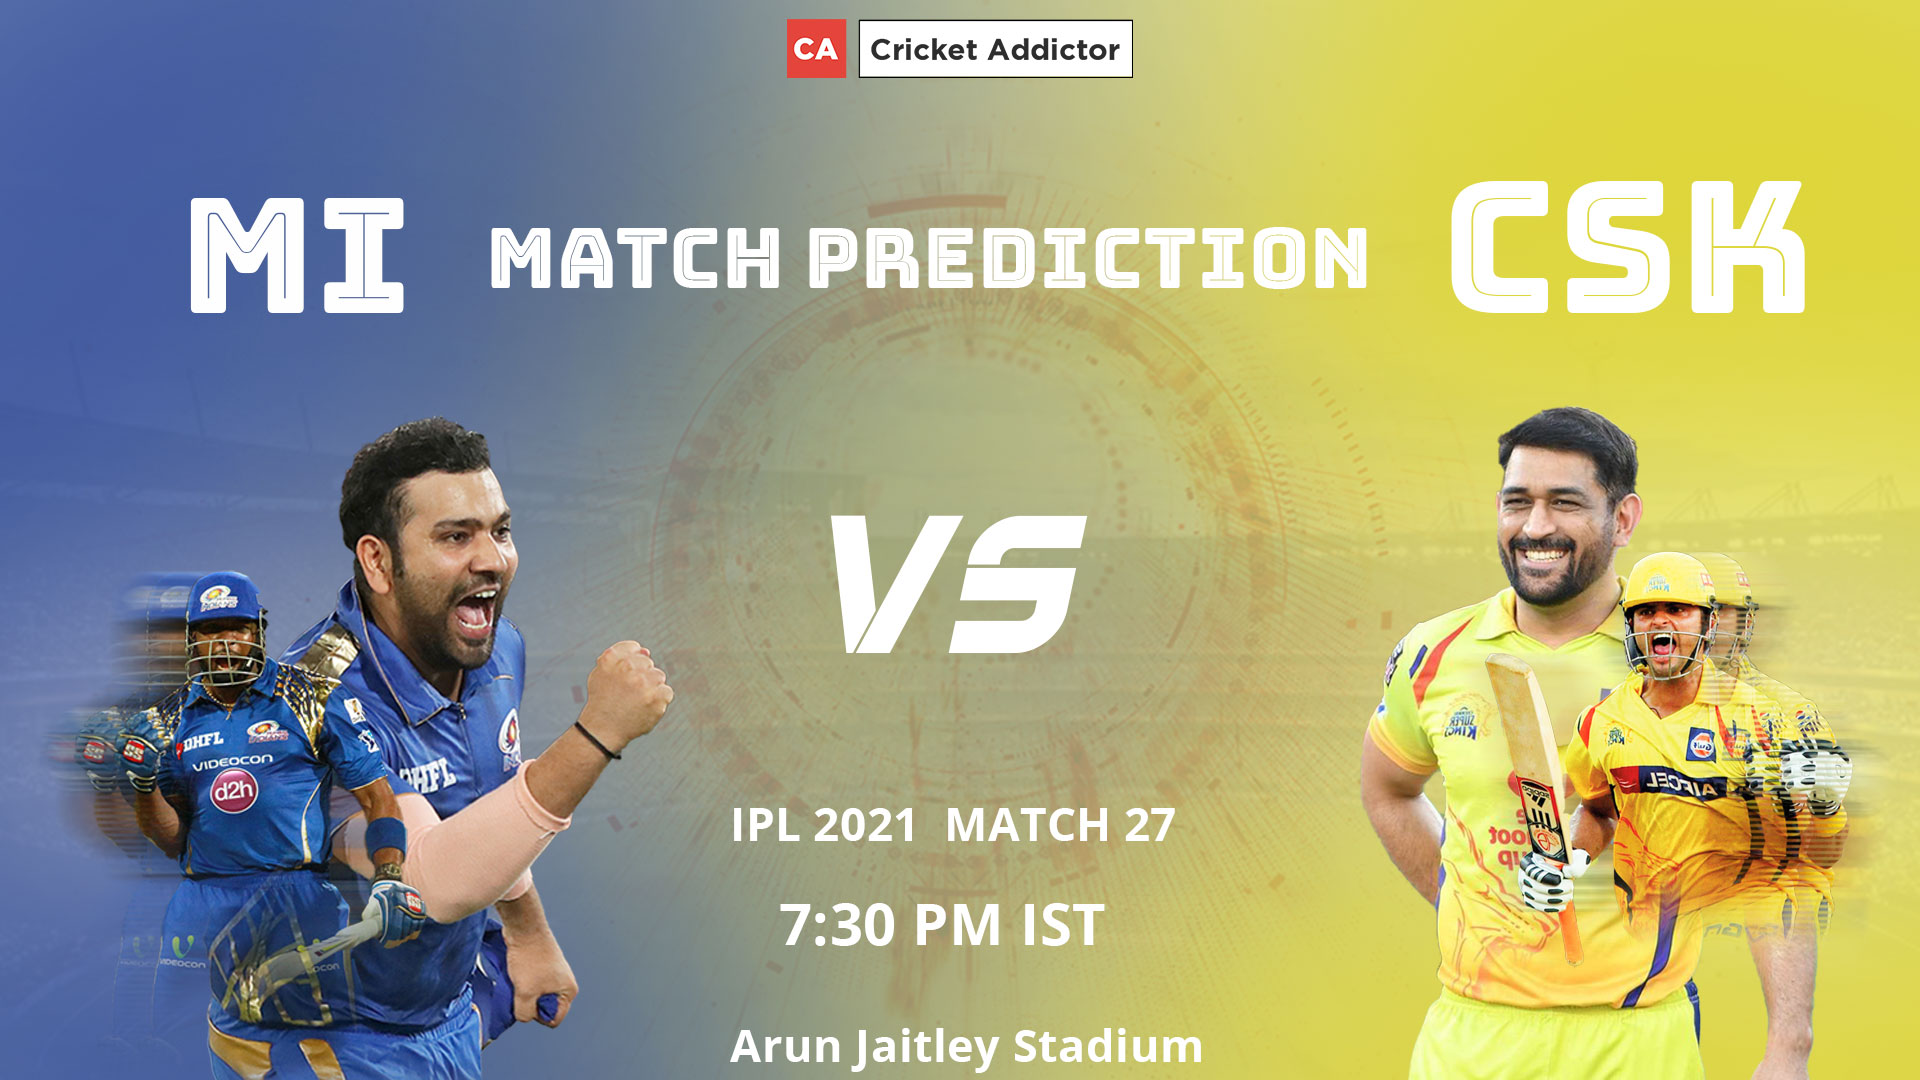 IPL 2021, MI vs CSK, Match Prediction, Winner, Most Runs, Most Wickets